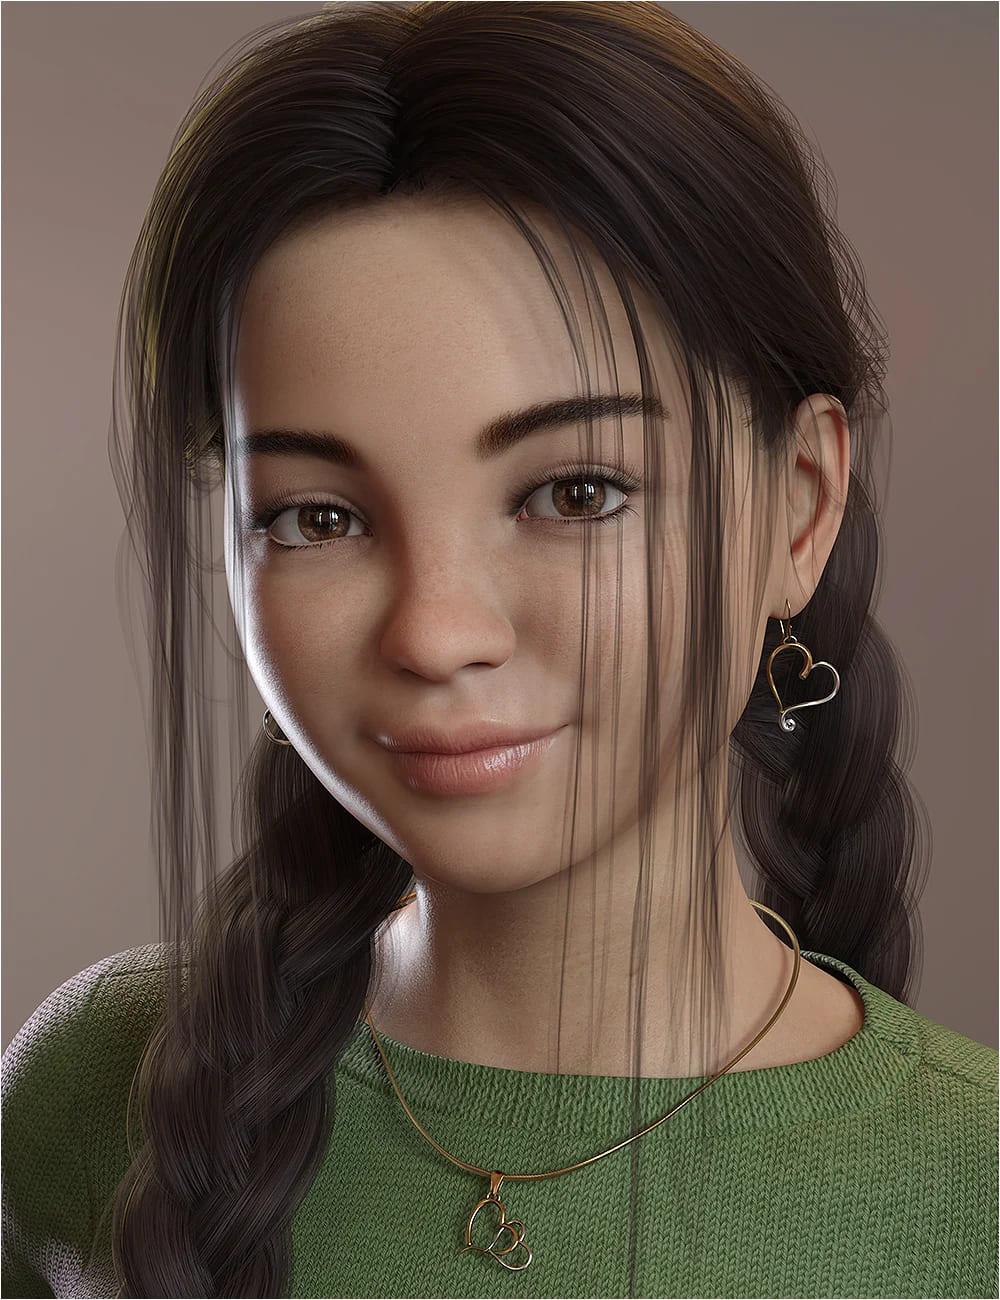 Chrystal Ann for Genesis 8 and Genesis 8.1 Female_DAZ3D下载站